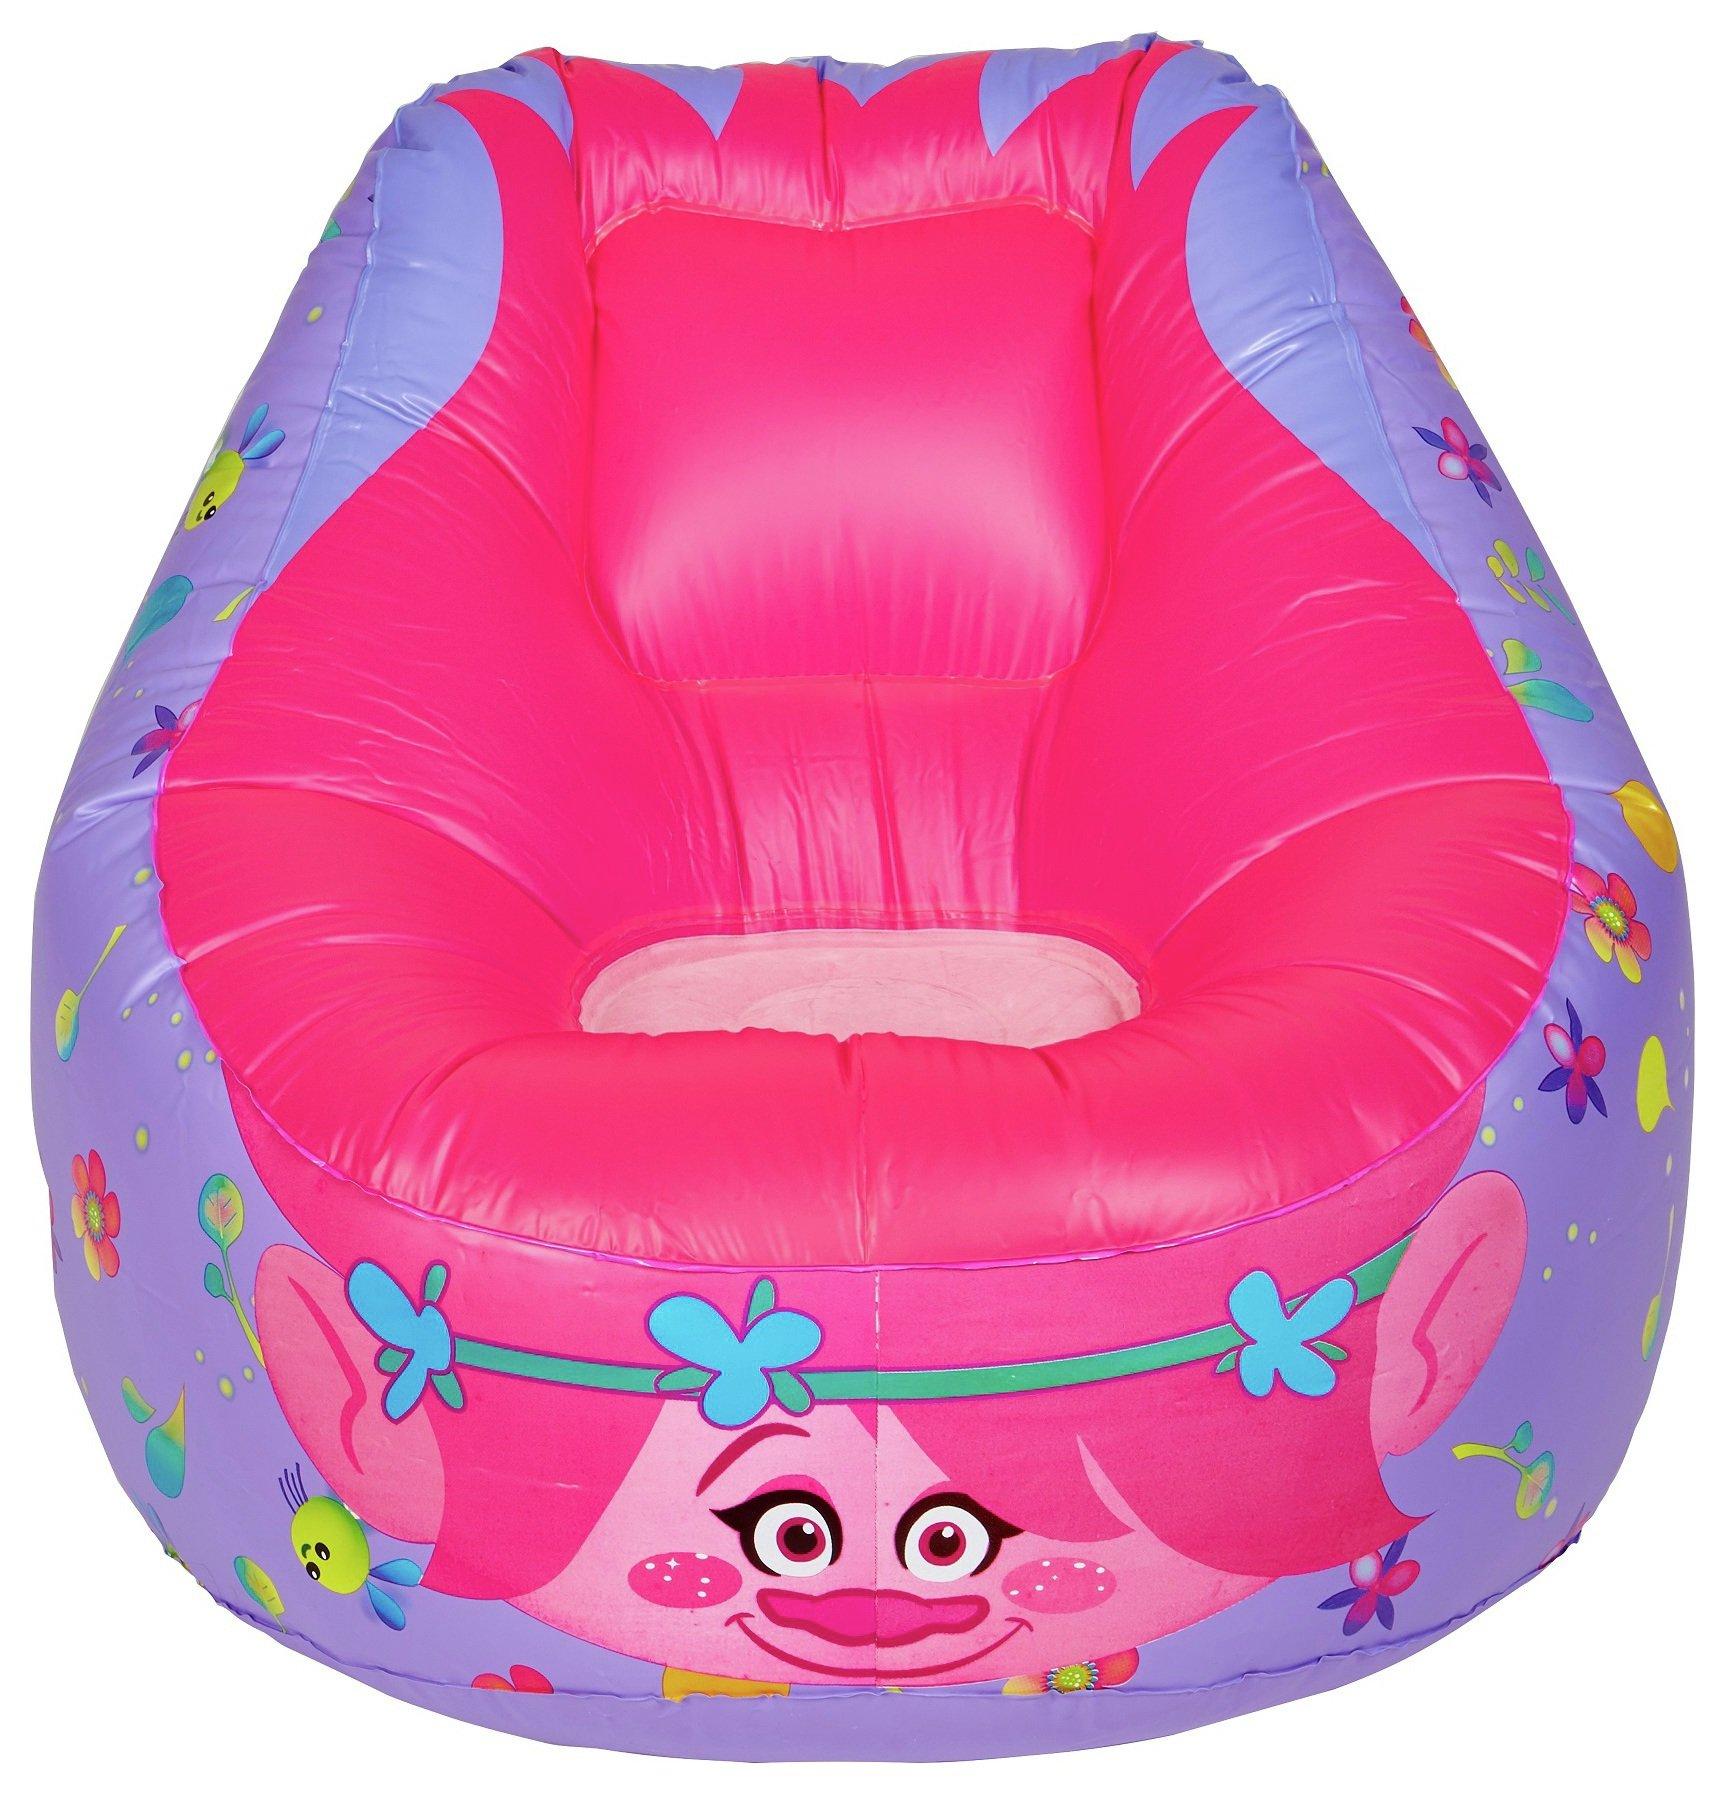 Pool Inflatables: Pool Inflatable Toys, Inflatable